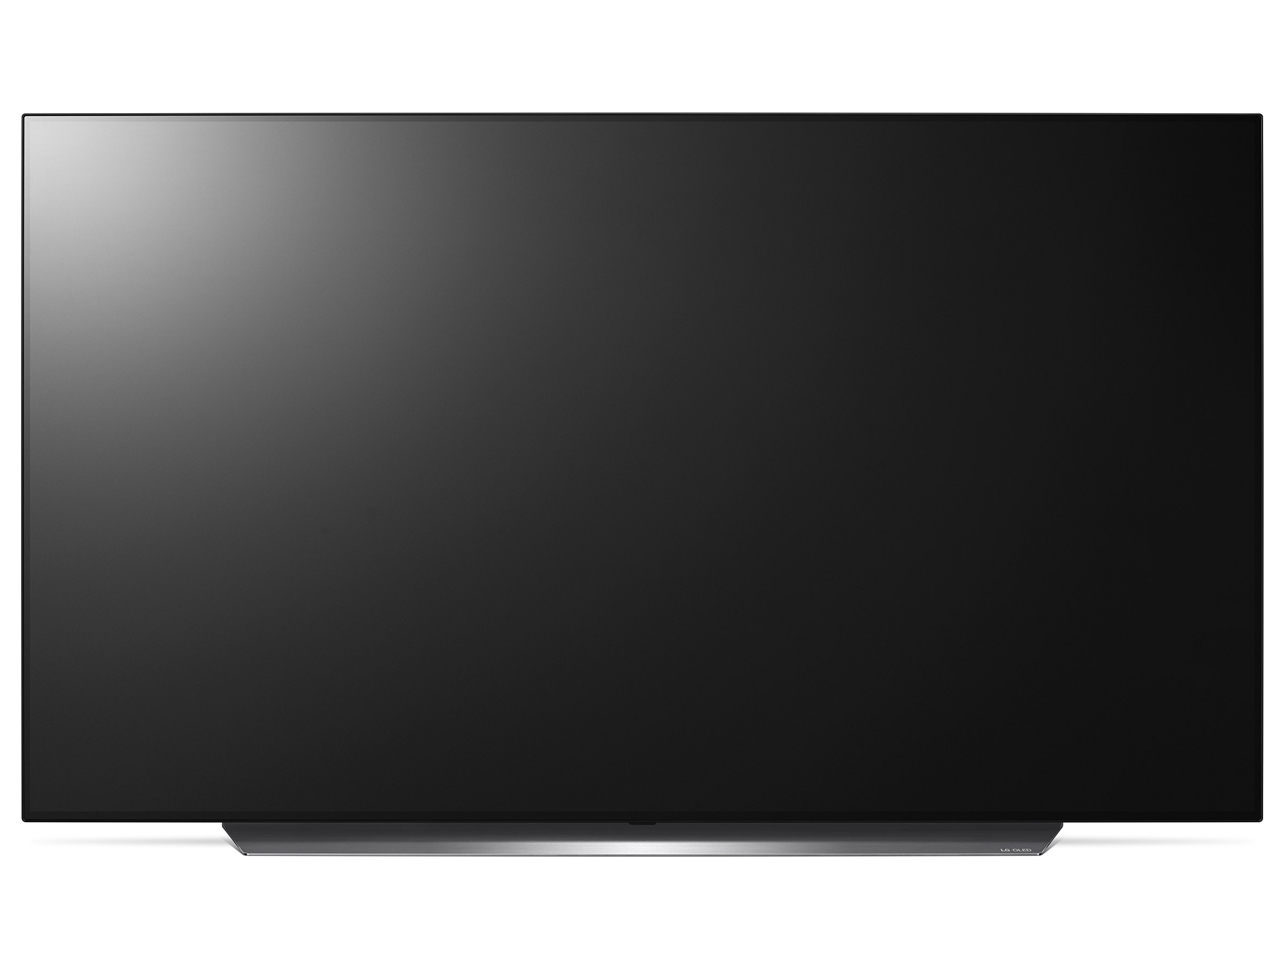 LGの55型有機ELテレビ:OLED55C9PJA